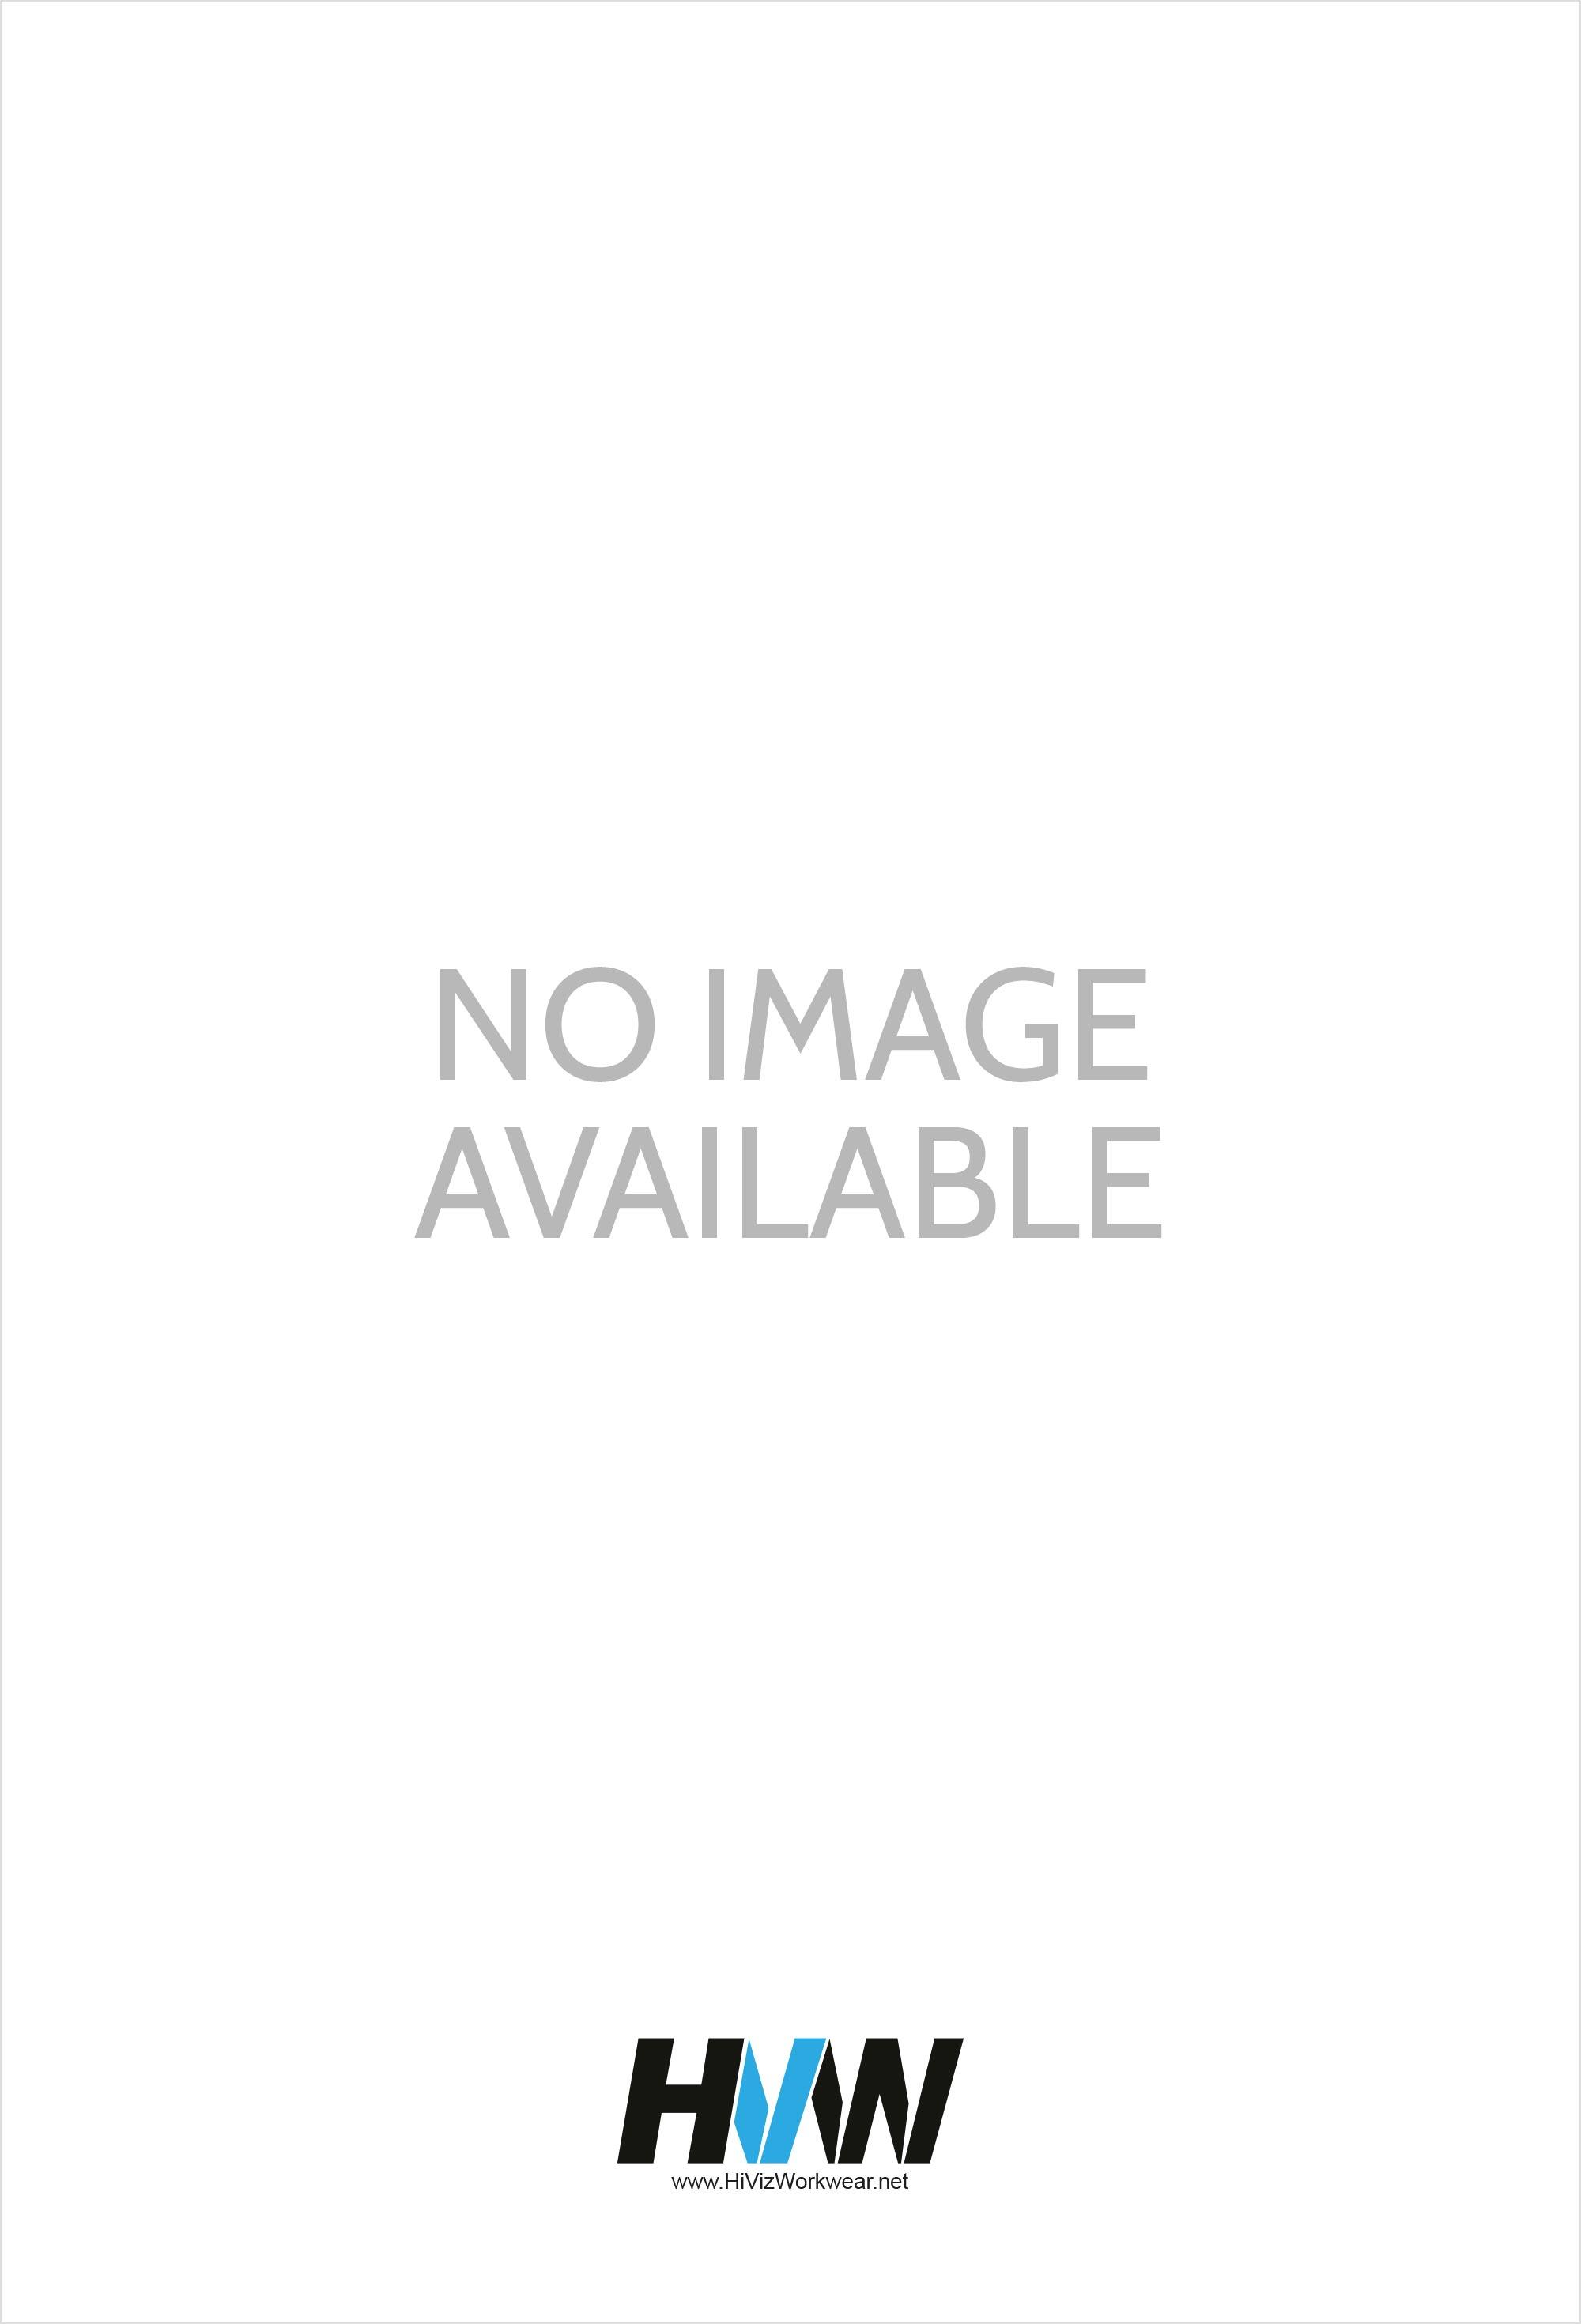 Kariban KB358 Long Sleeved V-Neck T-Shirt (Small To 4XL)